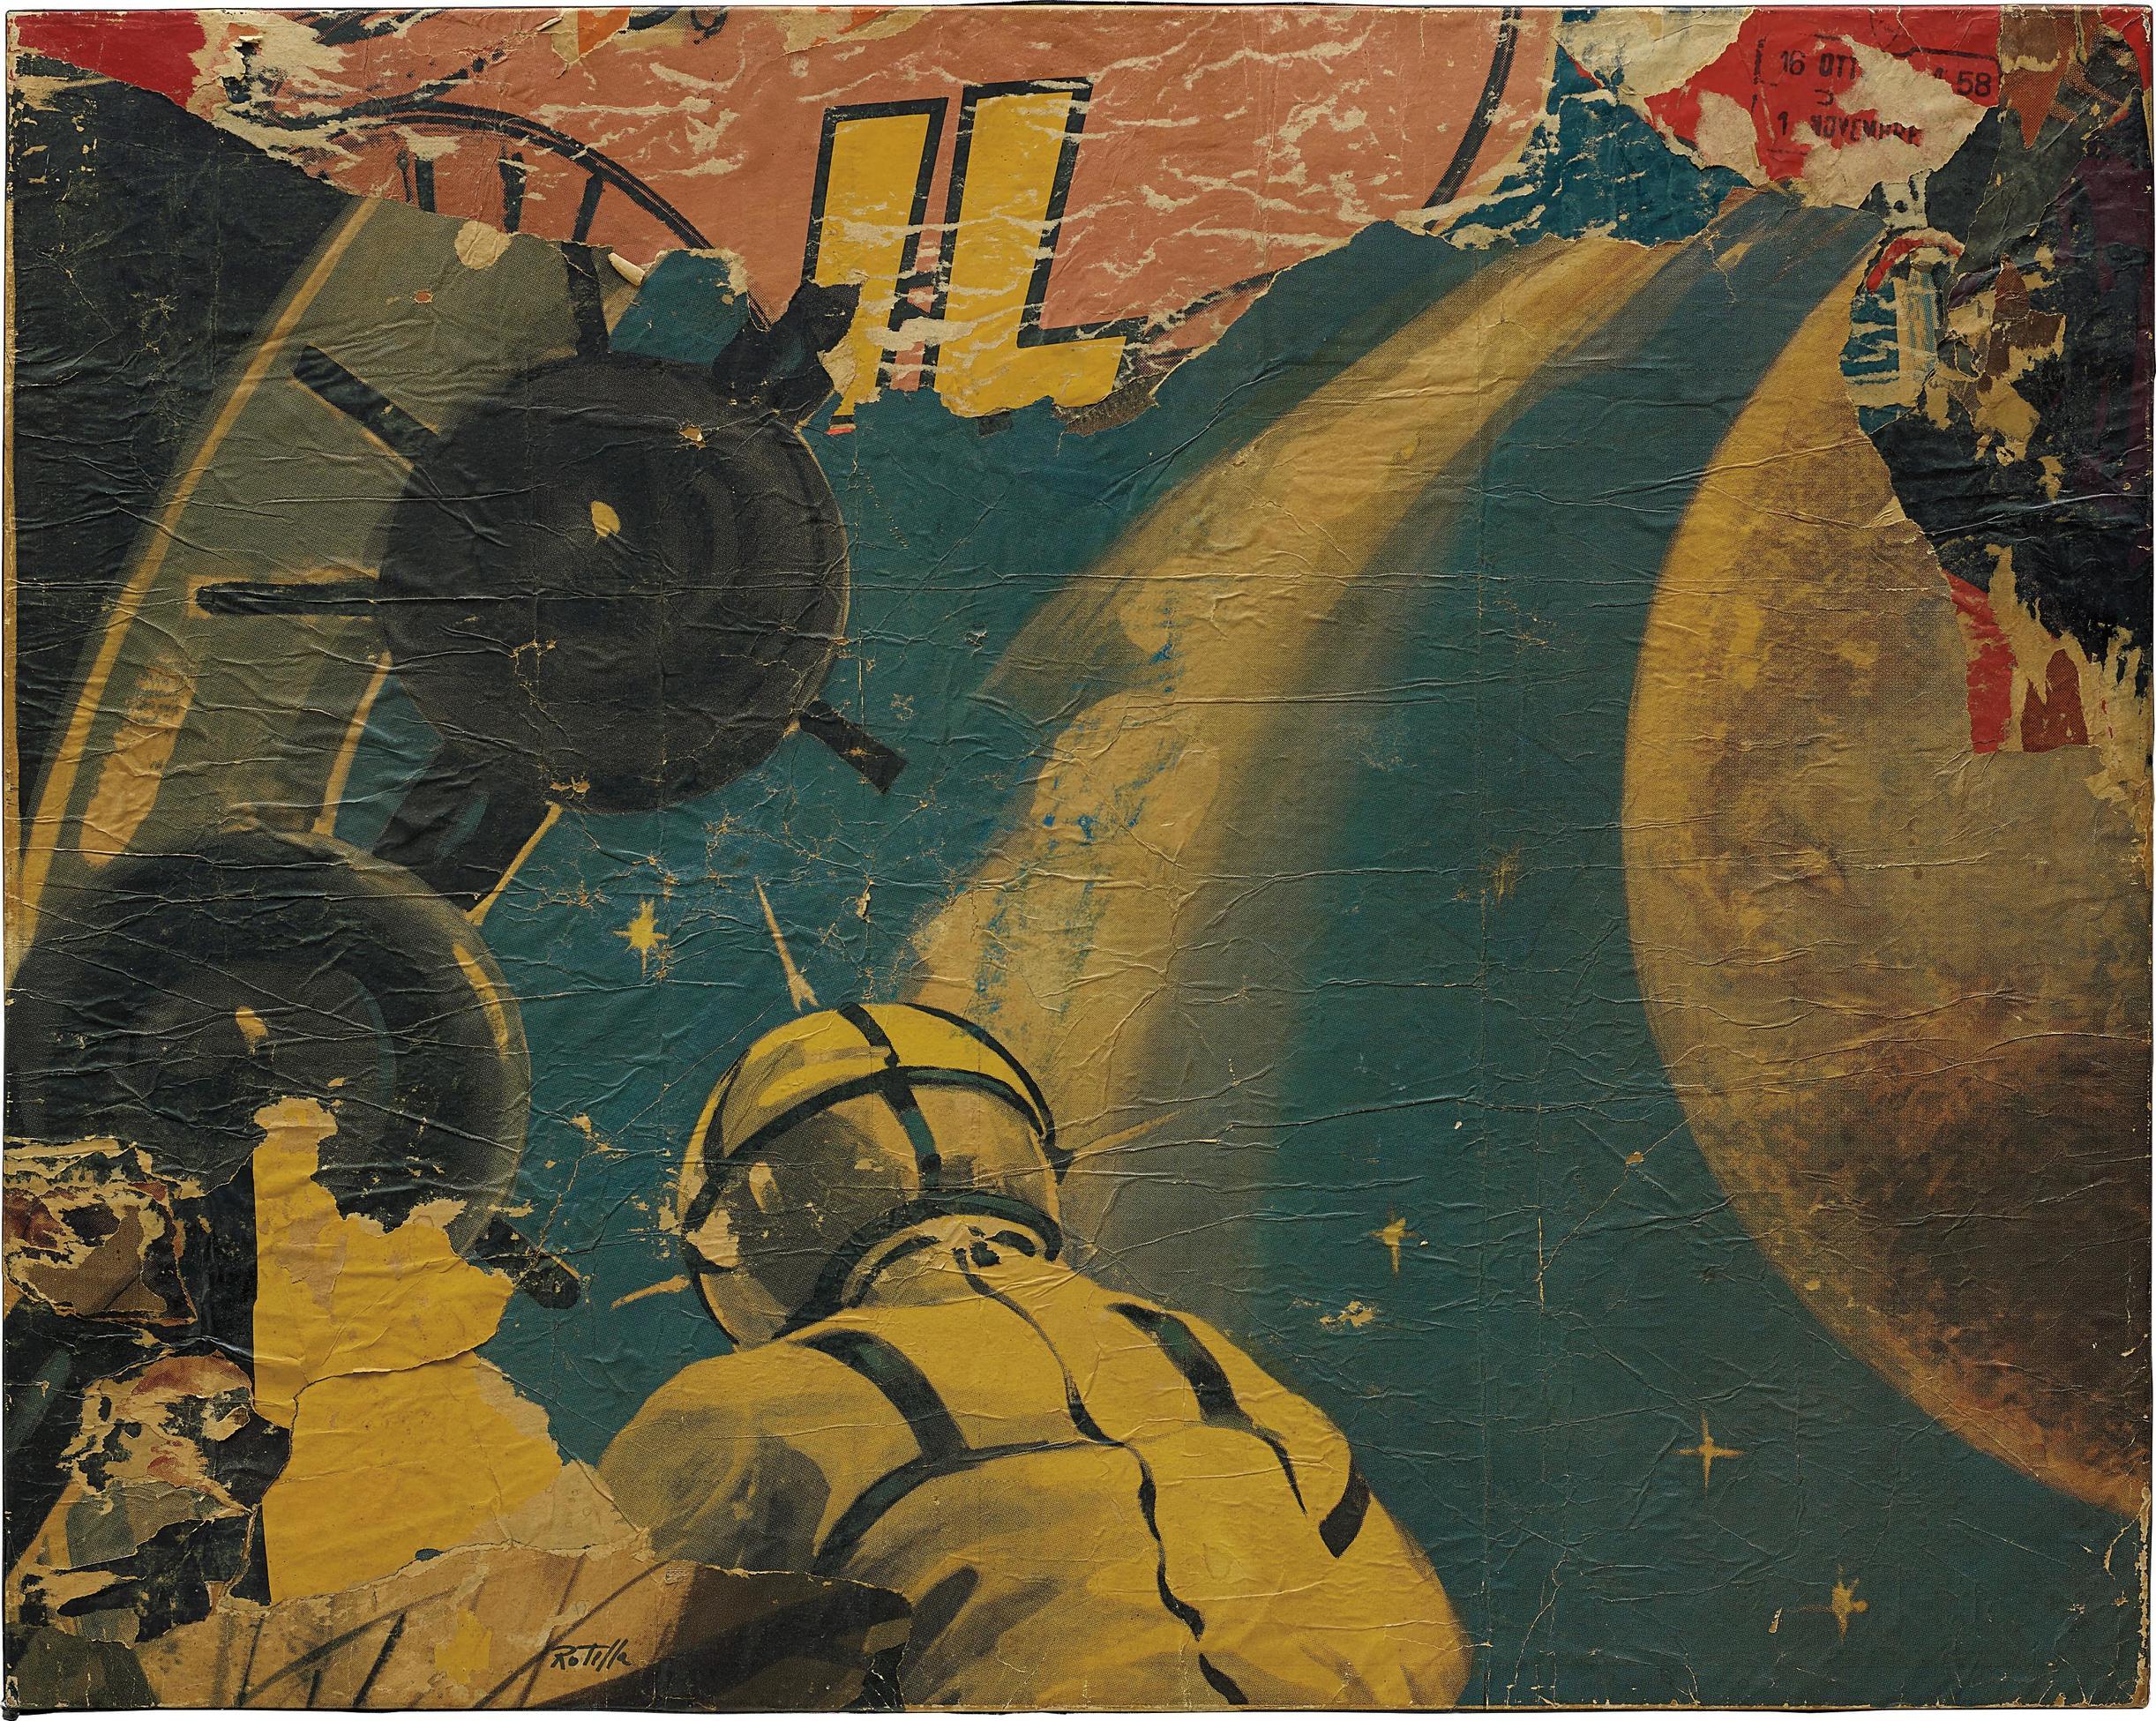 Mimmo Rotella-Untitled-1958